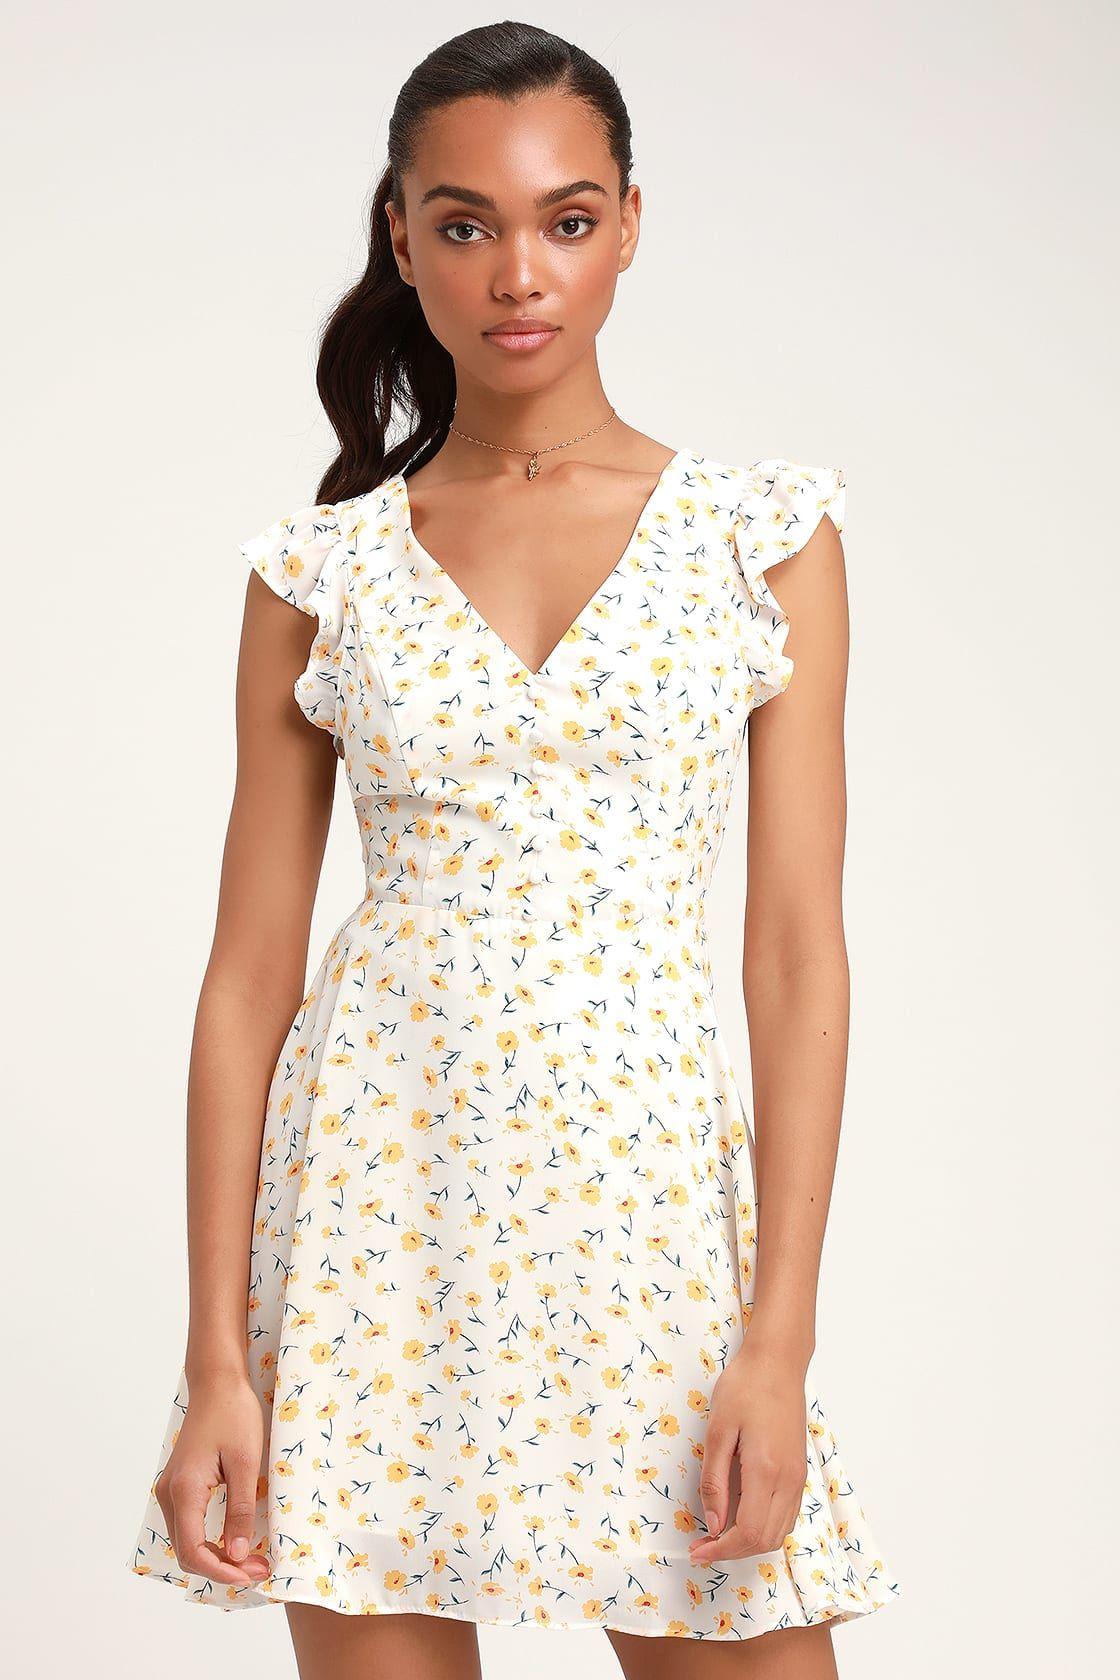 d797cd20d9 Lulus | Strike a Posie White Floral Print Backless Skater Dress ...